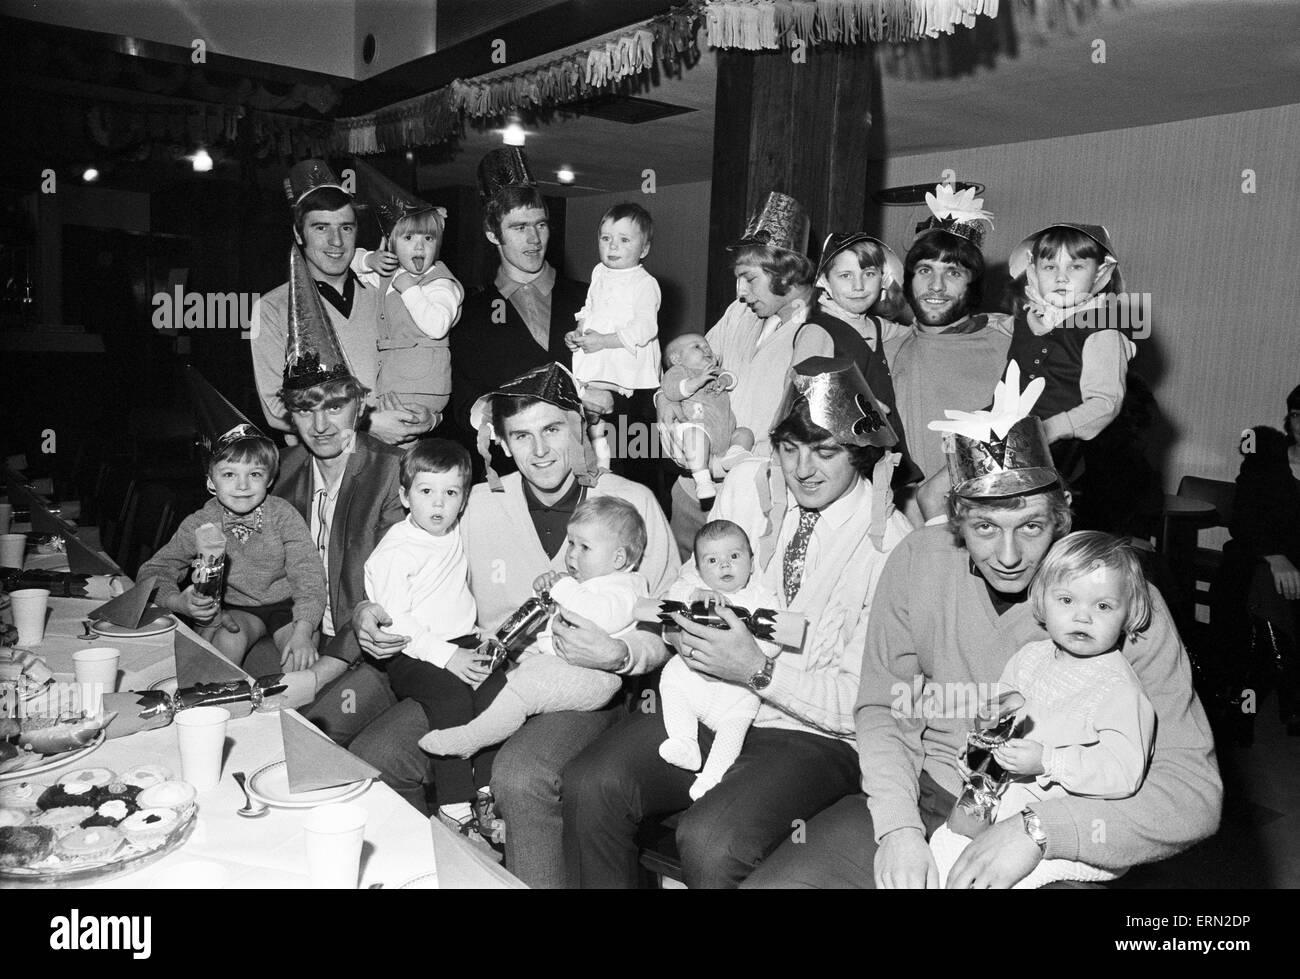 Christmas Party Birmingham Part - 30: Birmingham City Players Enjoying The Clubu0027s Christmas Party With Their  Children. With Their Children Back